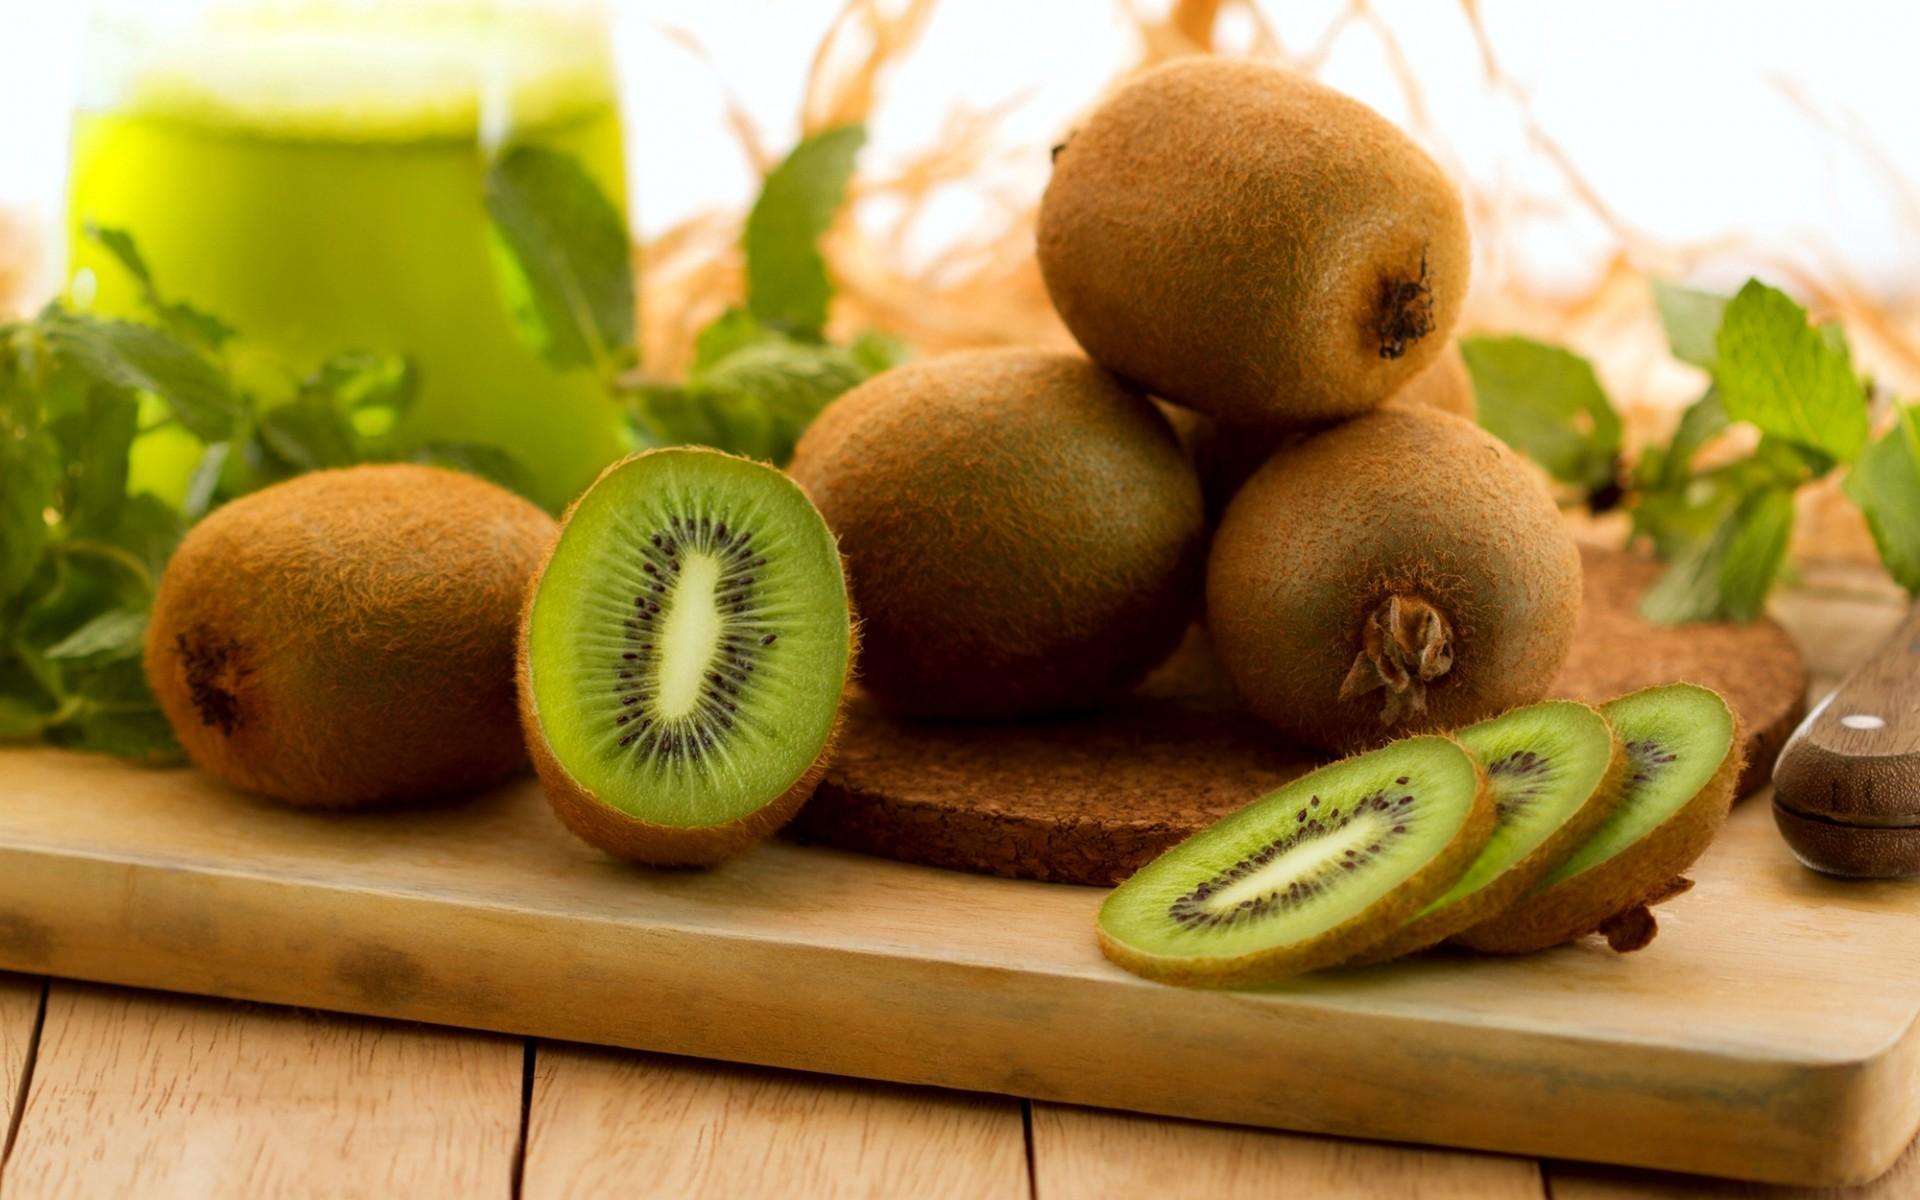 KiwiFruit (Chinese Gooseberry) - An ideal fruit for better health